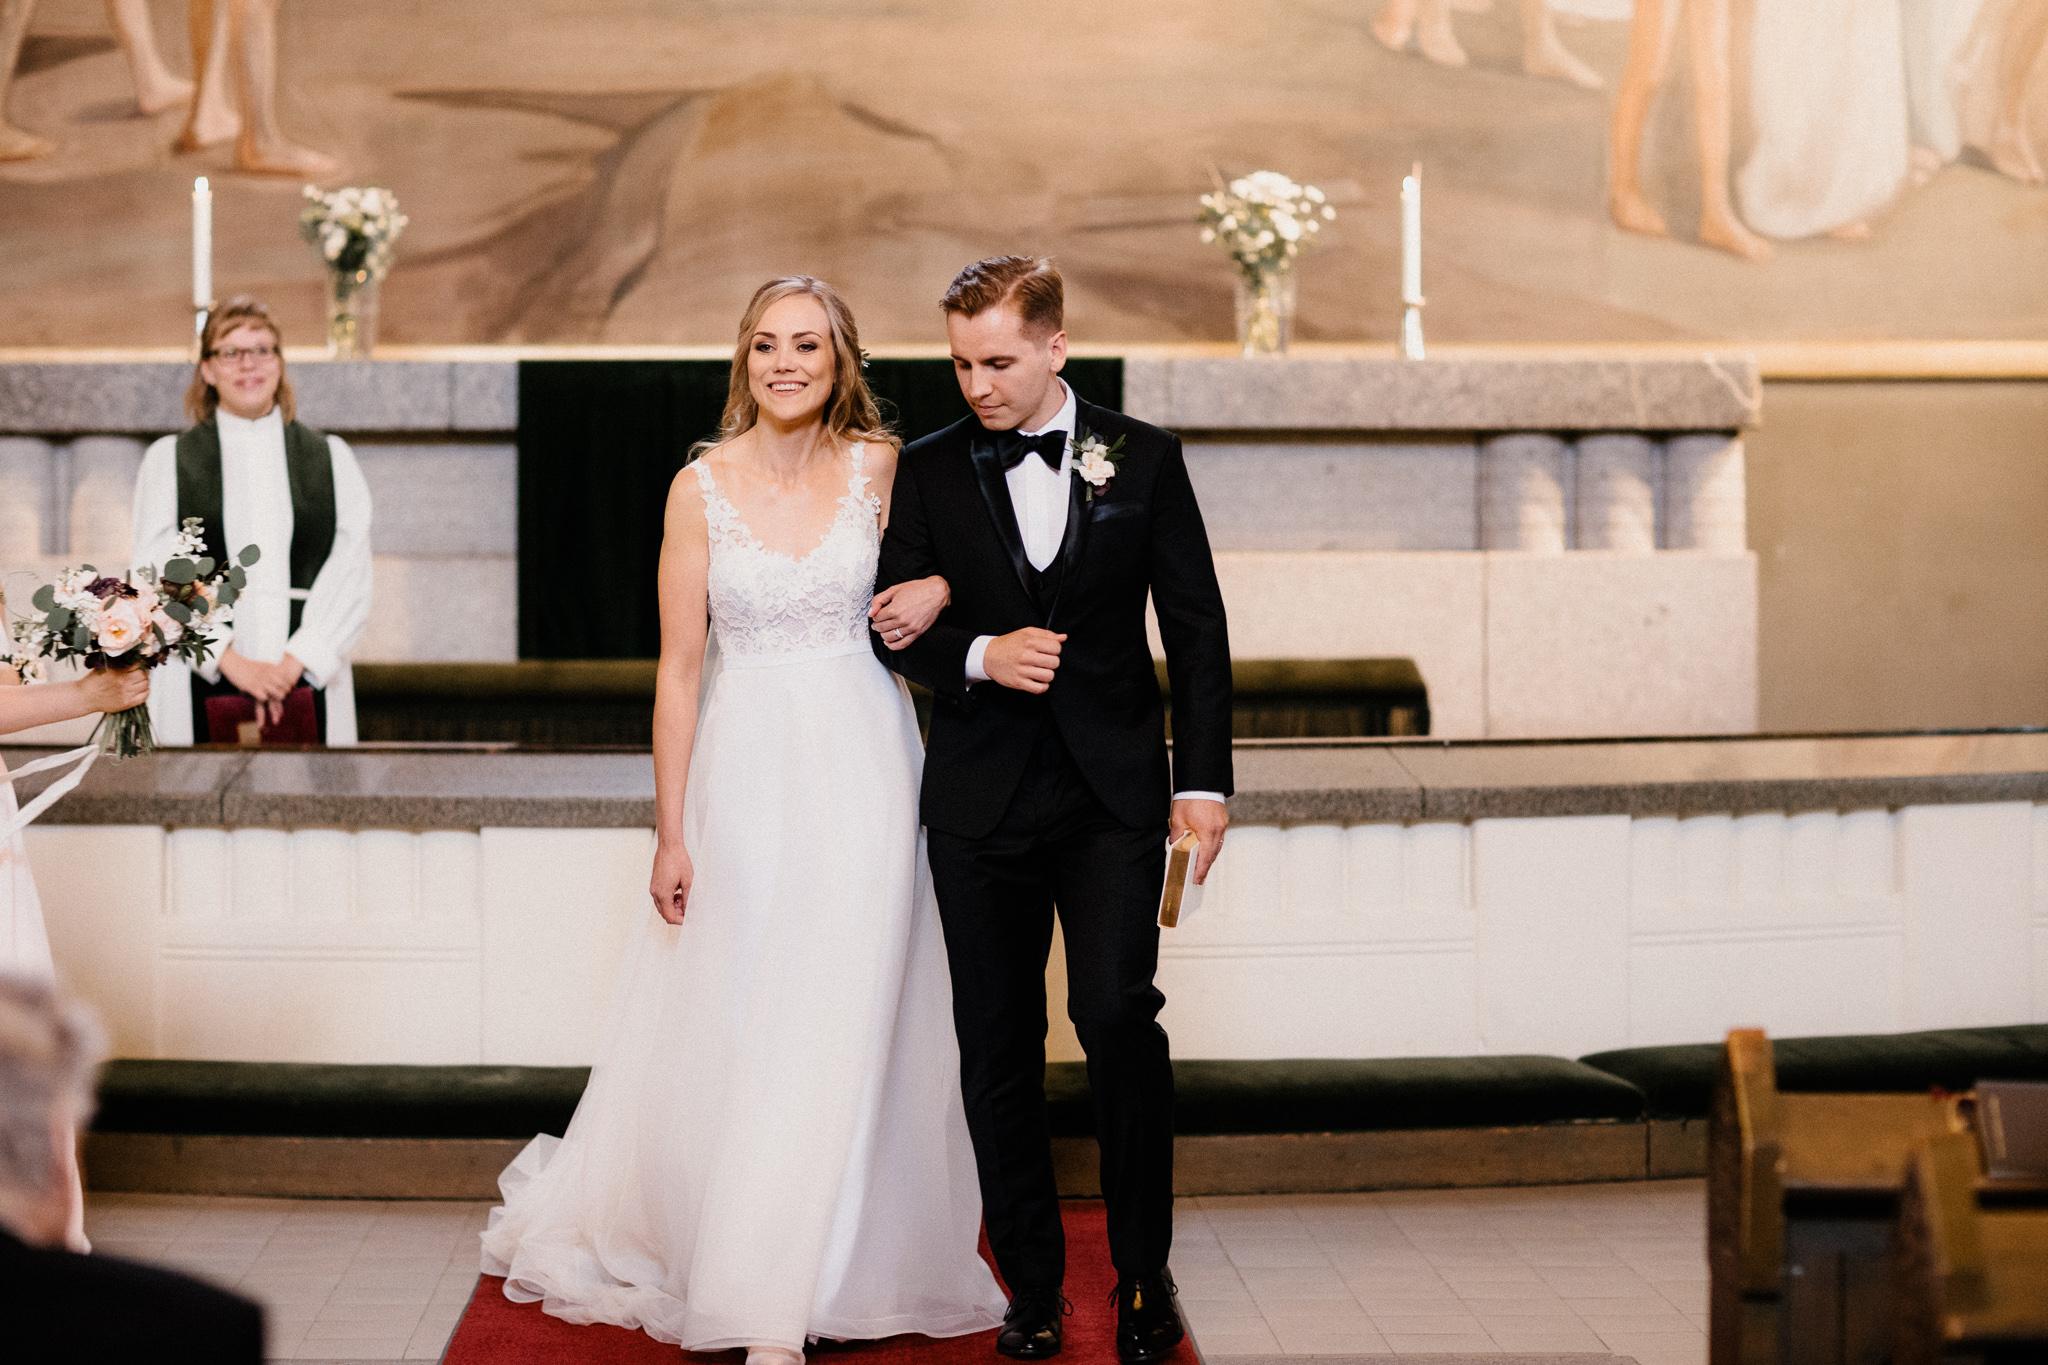 Johanna + Mikko - Tampere - Photo by Patrick Karkkolainen Wedding Photographer-75.jpg